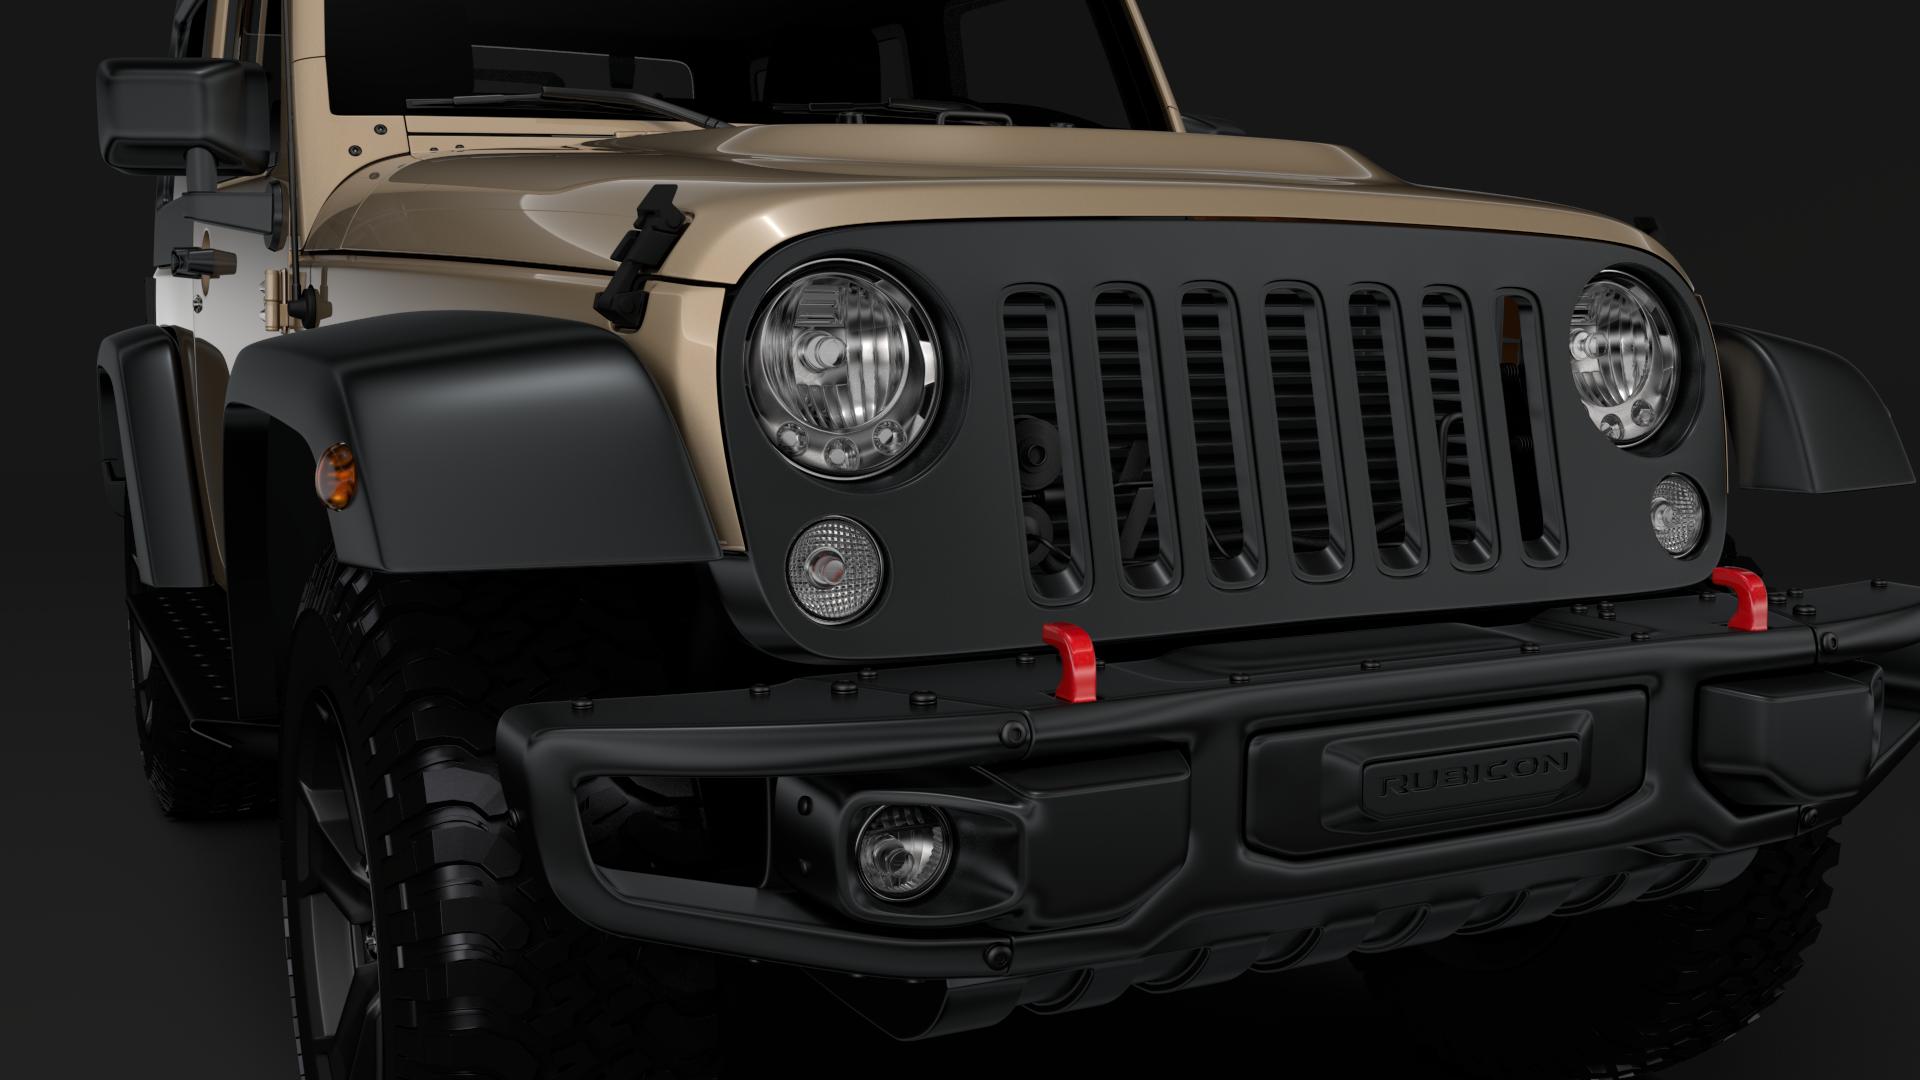 jeep wrangler rubicon recon jk 2017 3d model max fbx lwo ma mb hrc xsi obj 276945